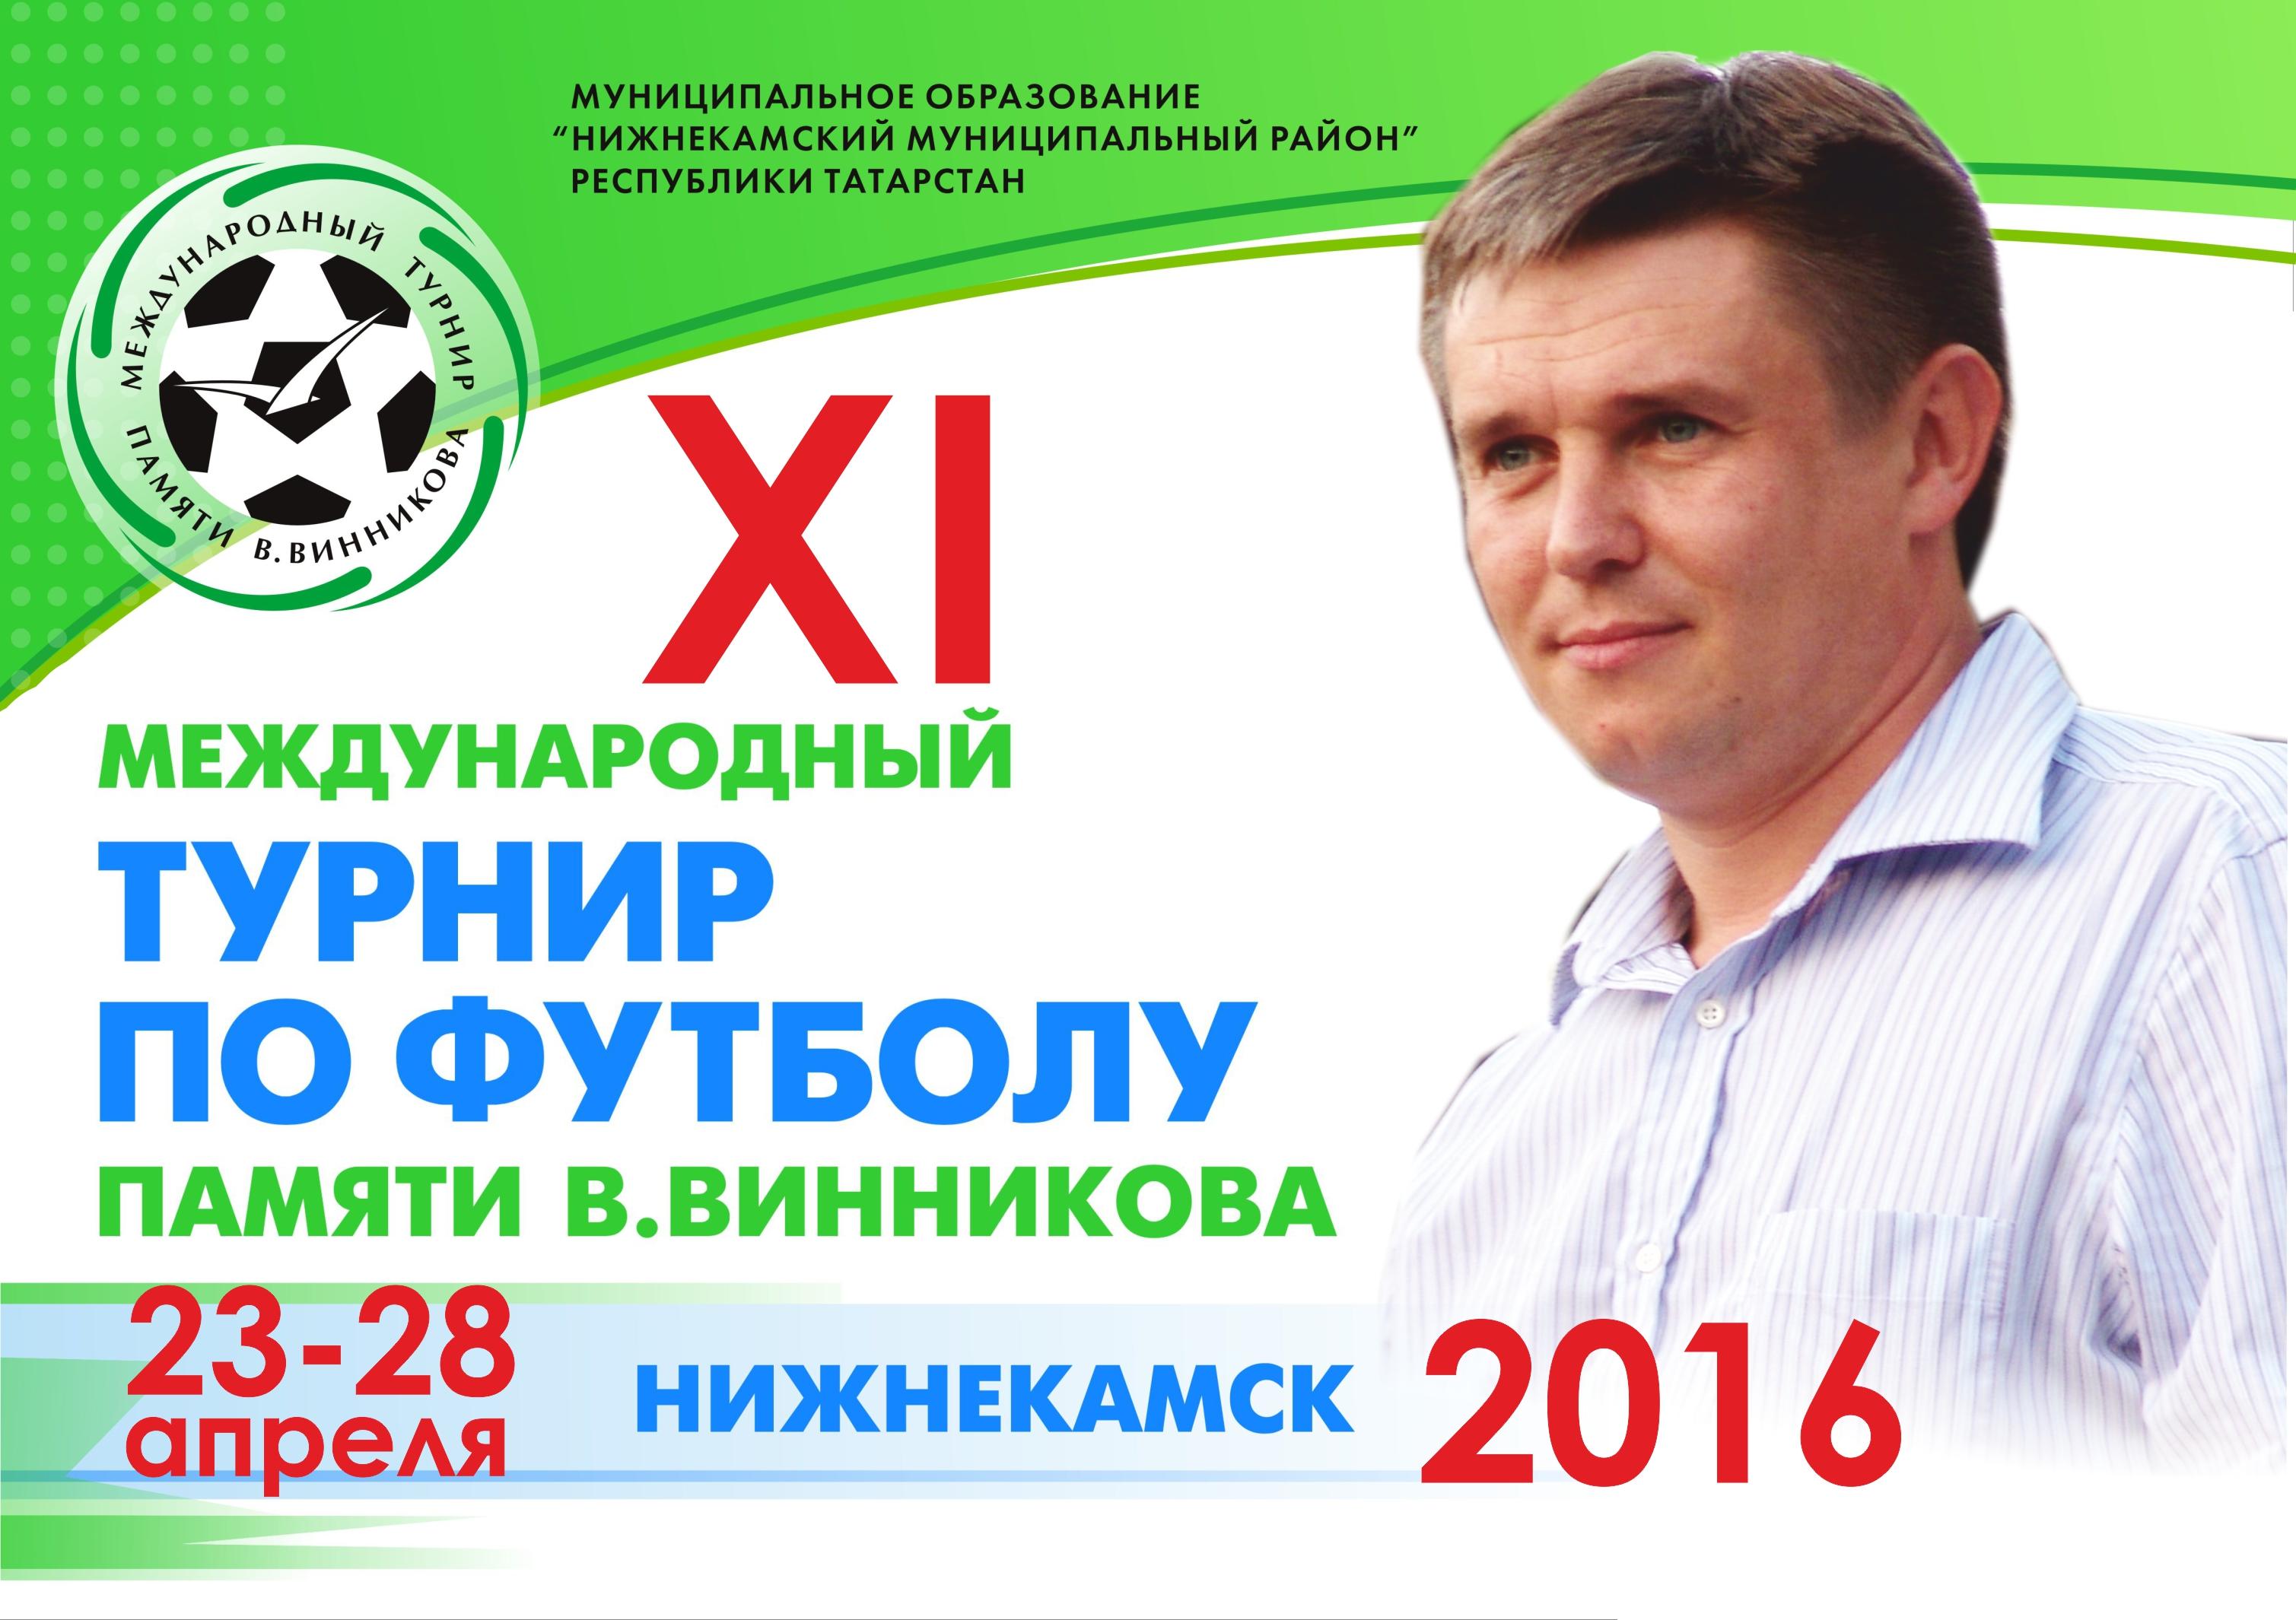 Афиша турнир Винникова 2016